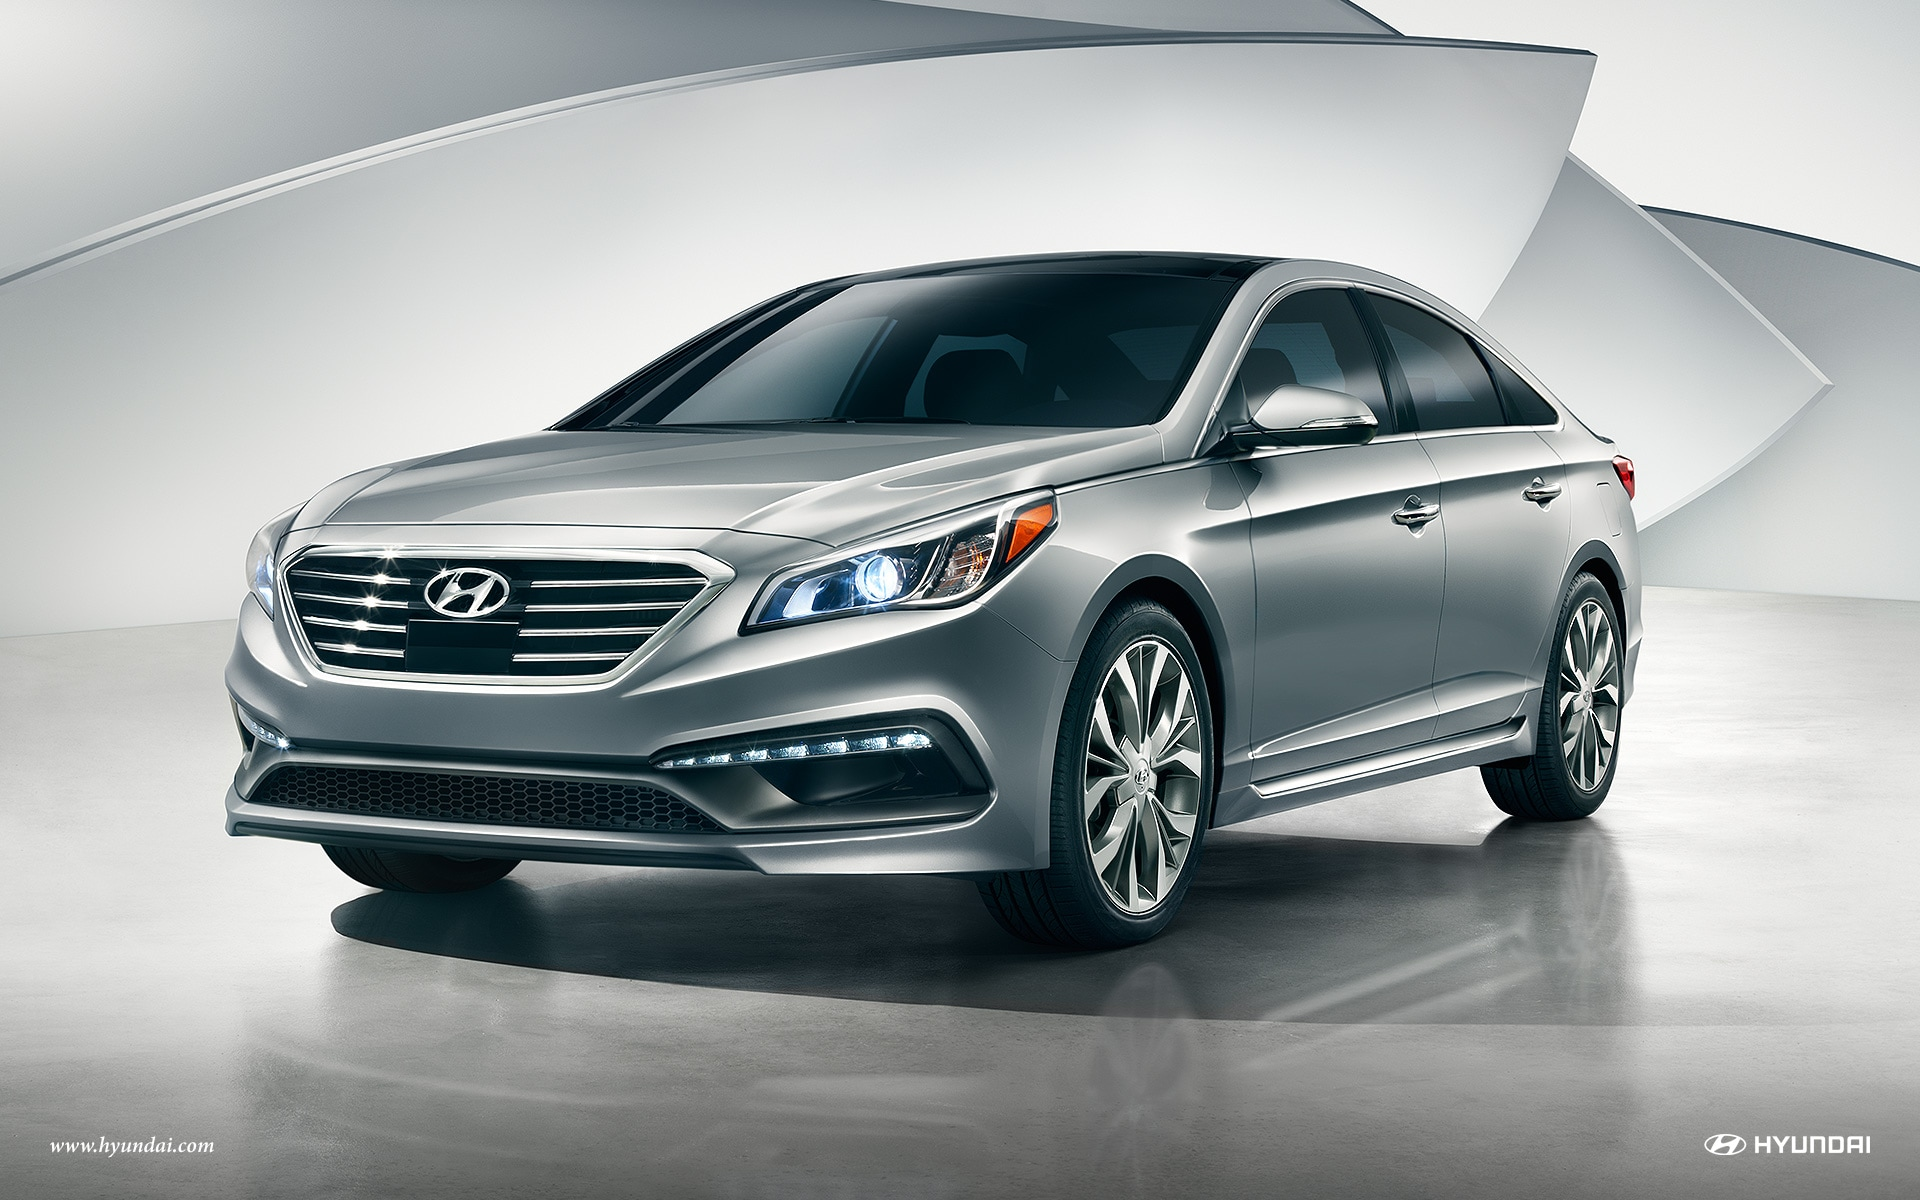 Hyundai Sonata: Blade inspection